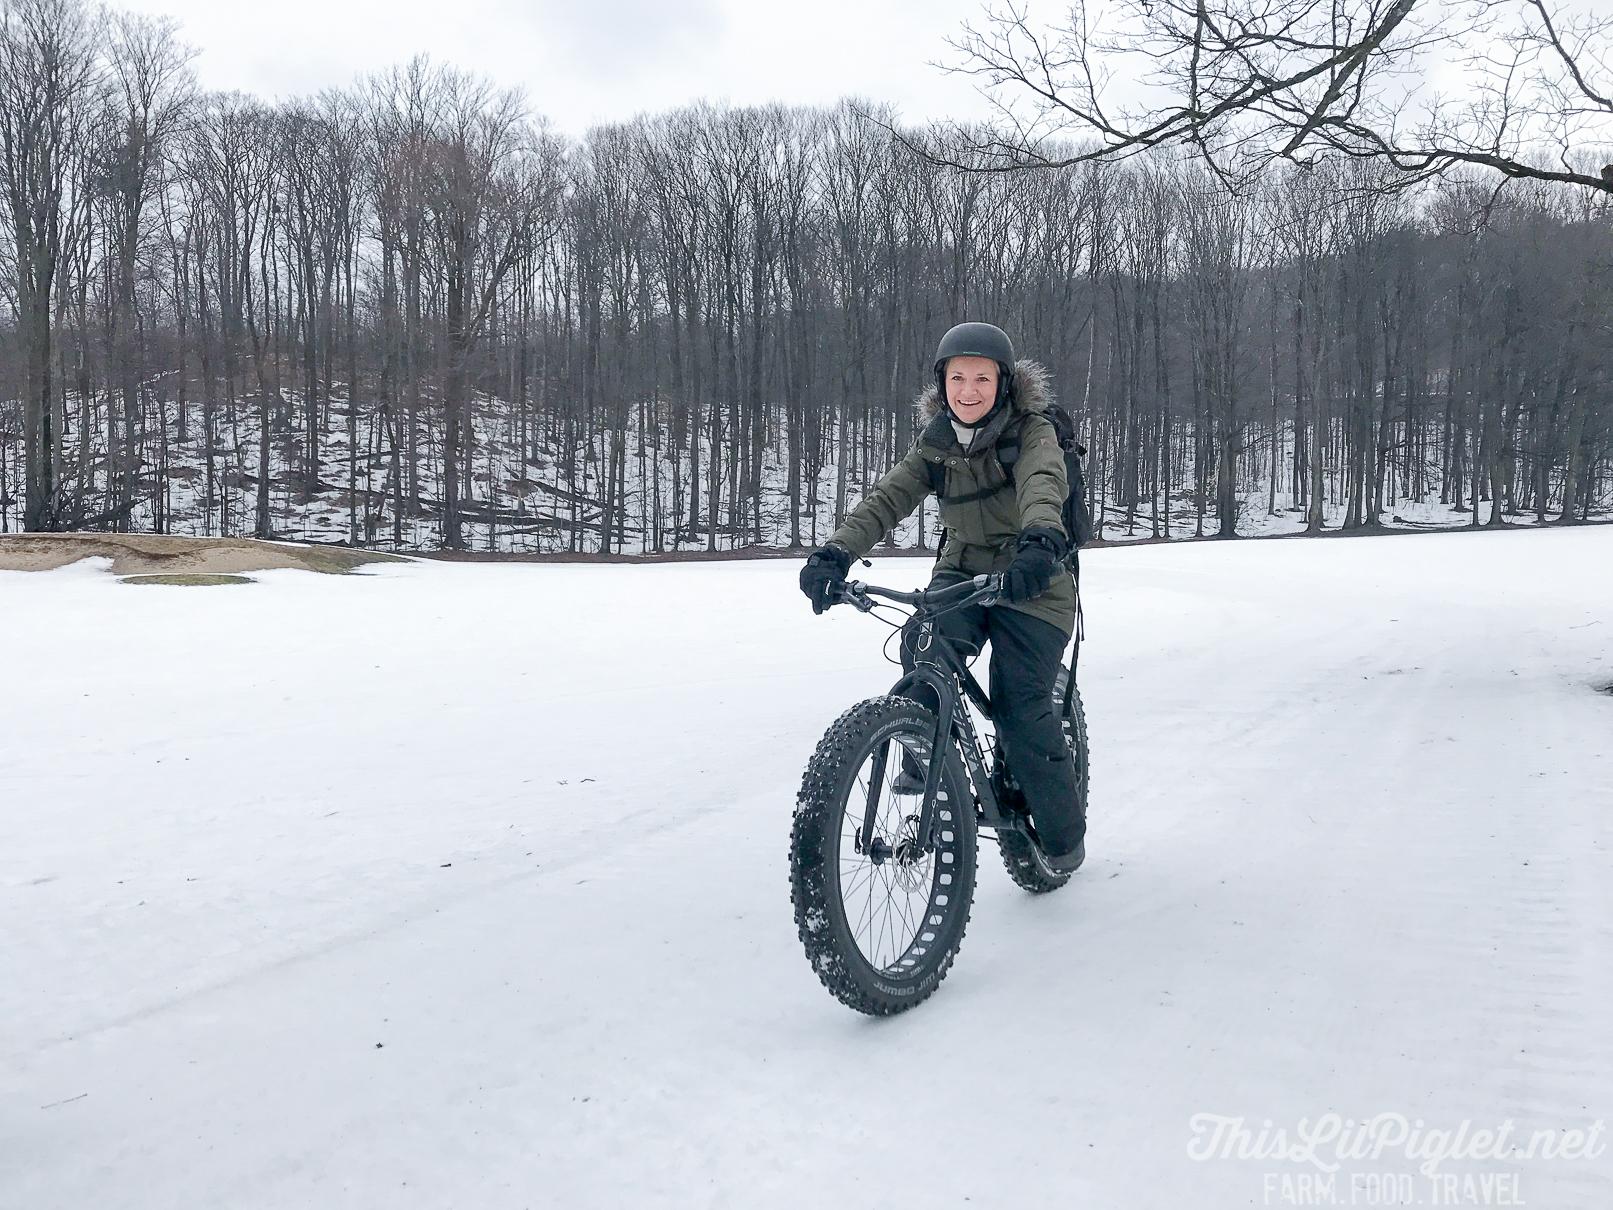 Girlfriend Getaways in Ontario's Lake Country - Fat Biking at Horseshoe Resort // thislilpiglet.net